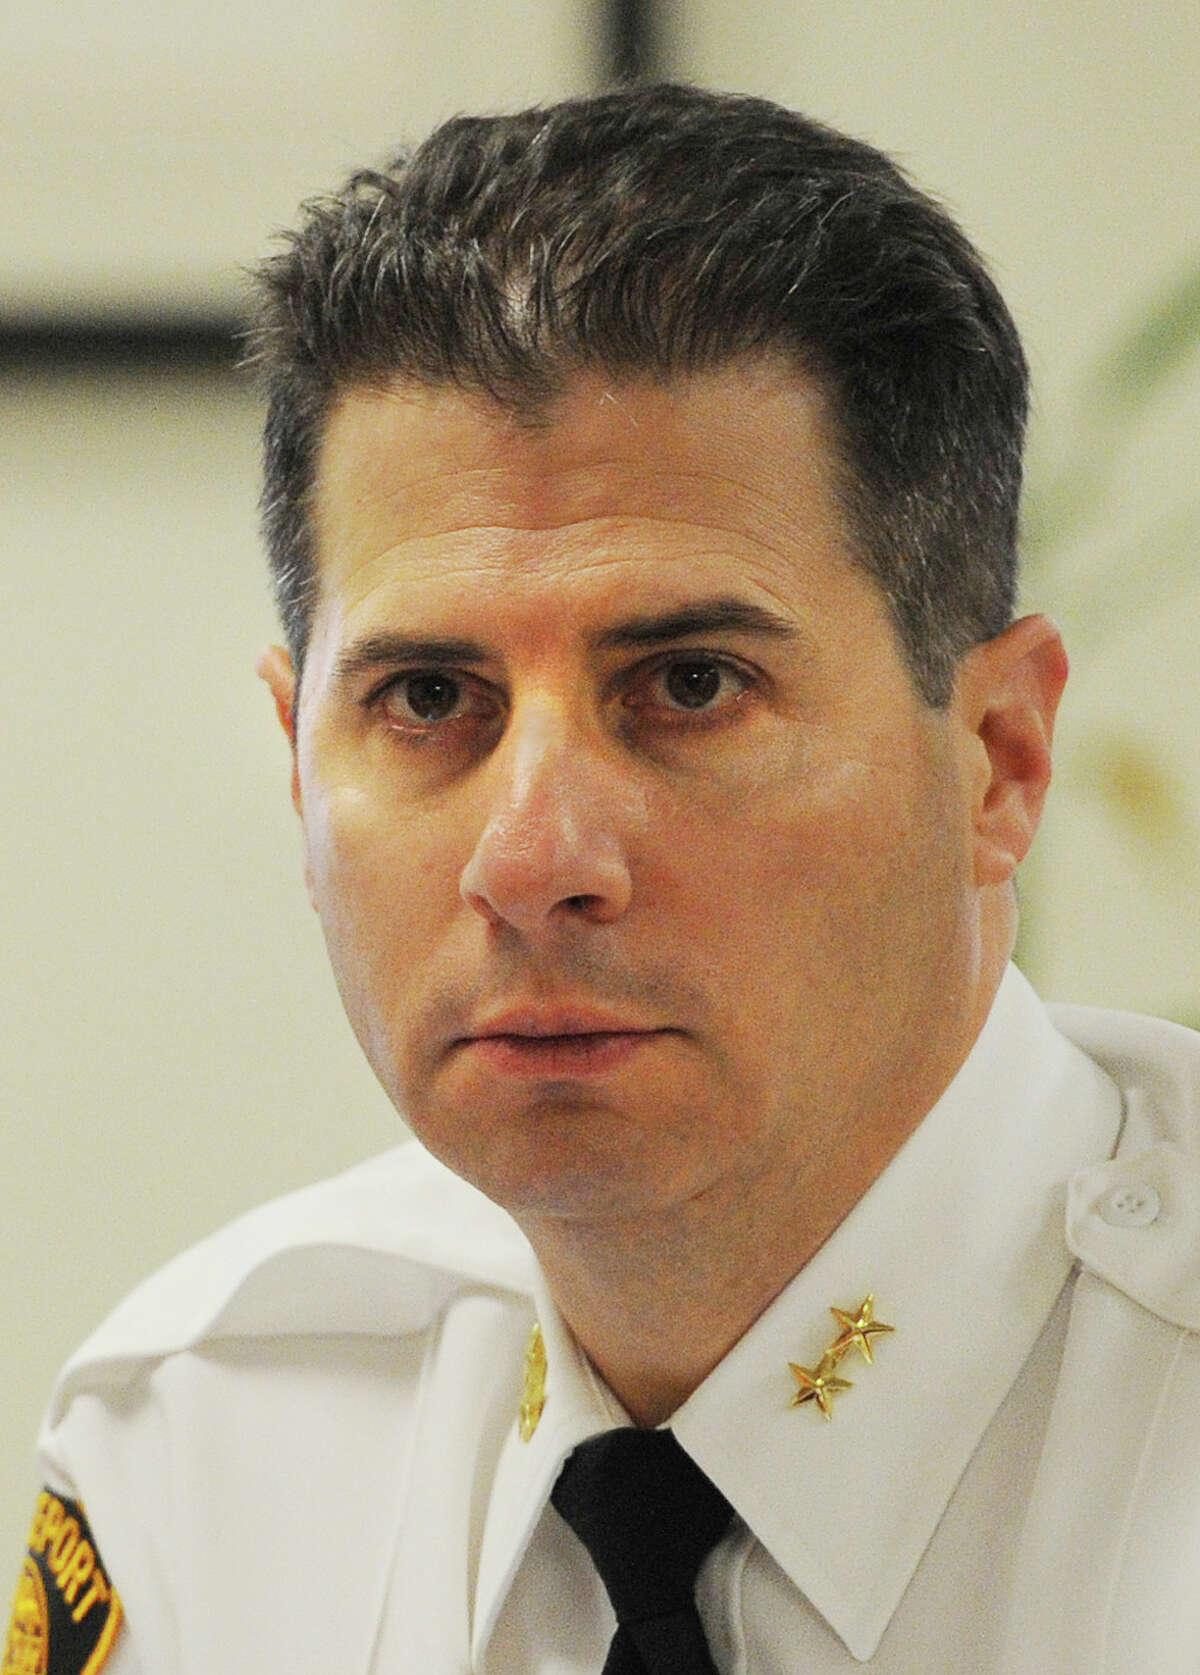 Bridgeport Police Assistant Chief James Nardozzi.